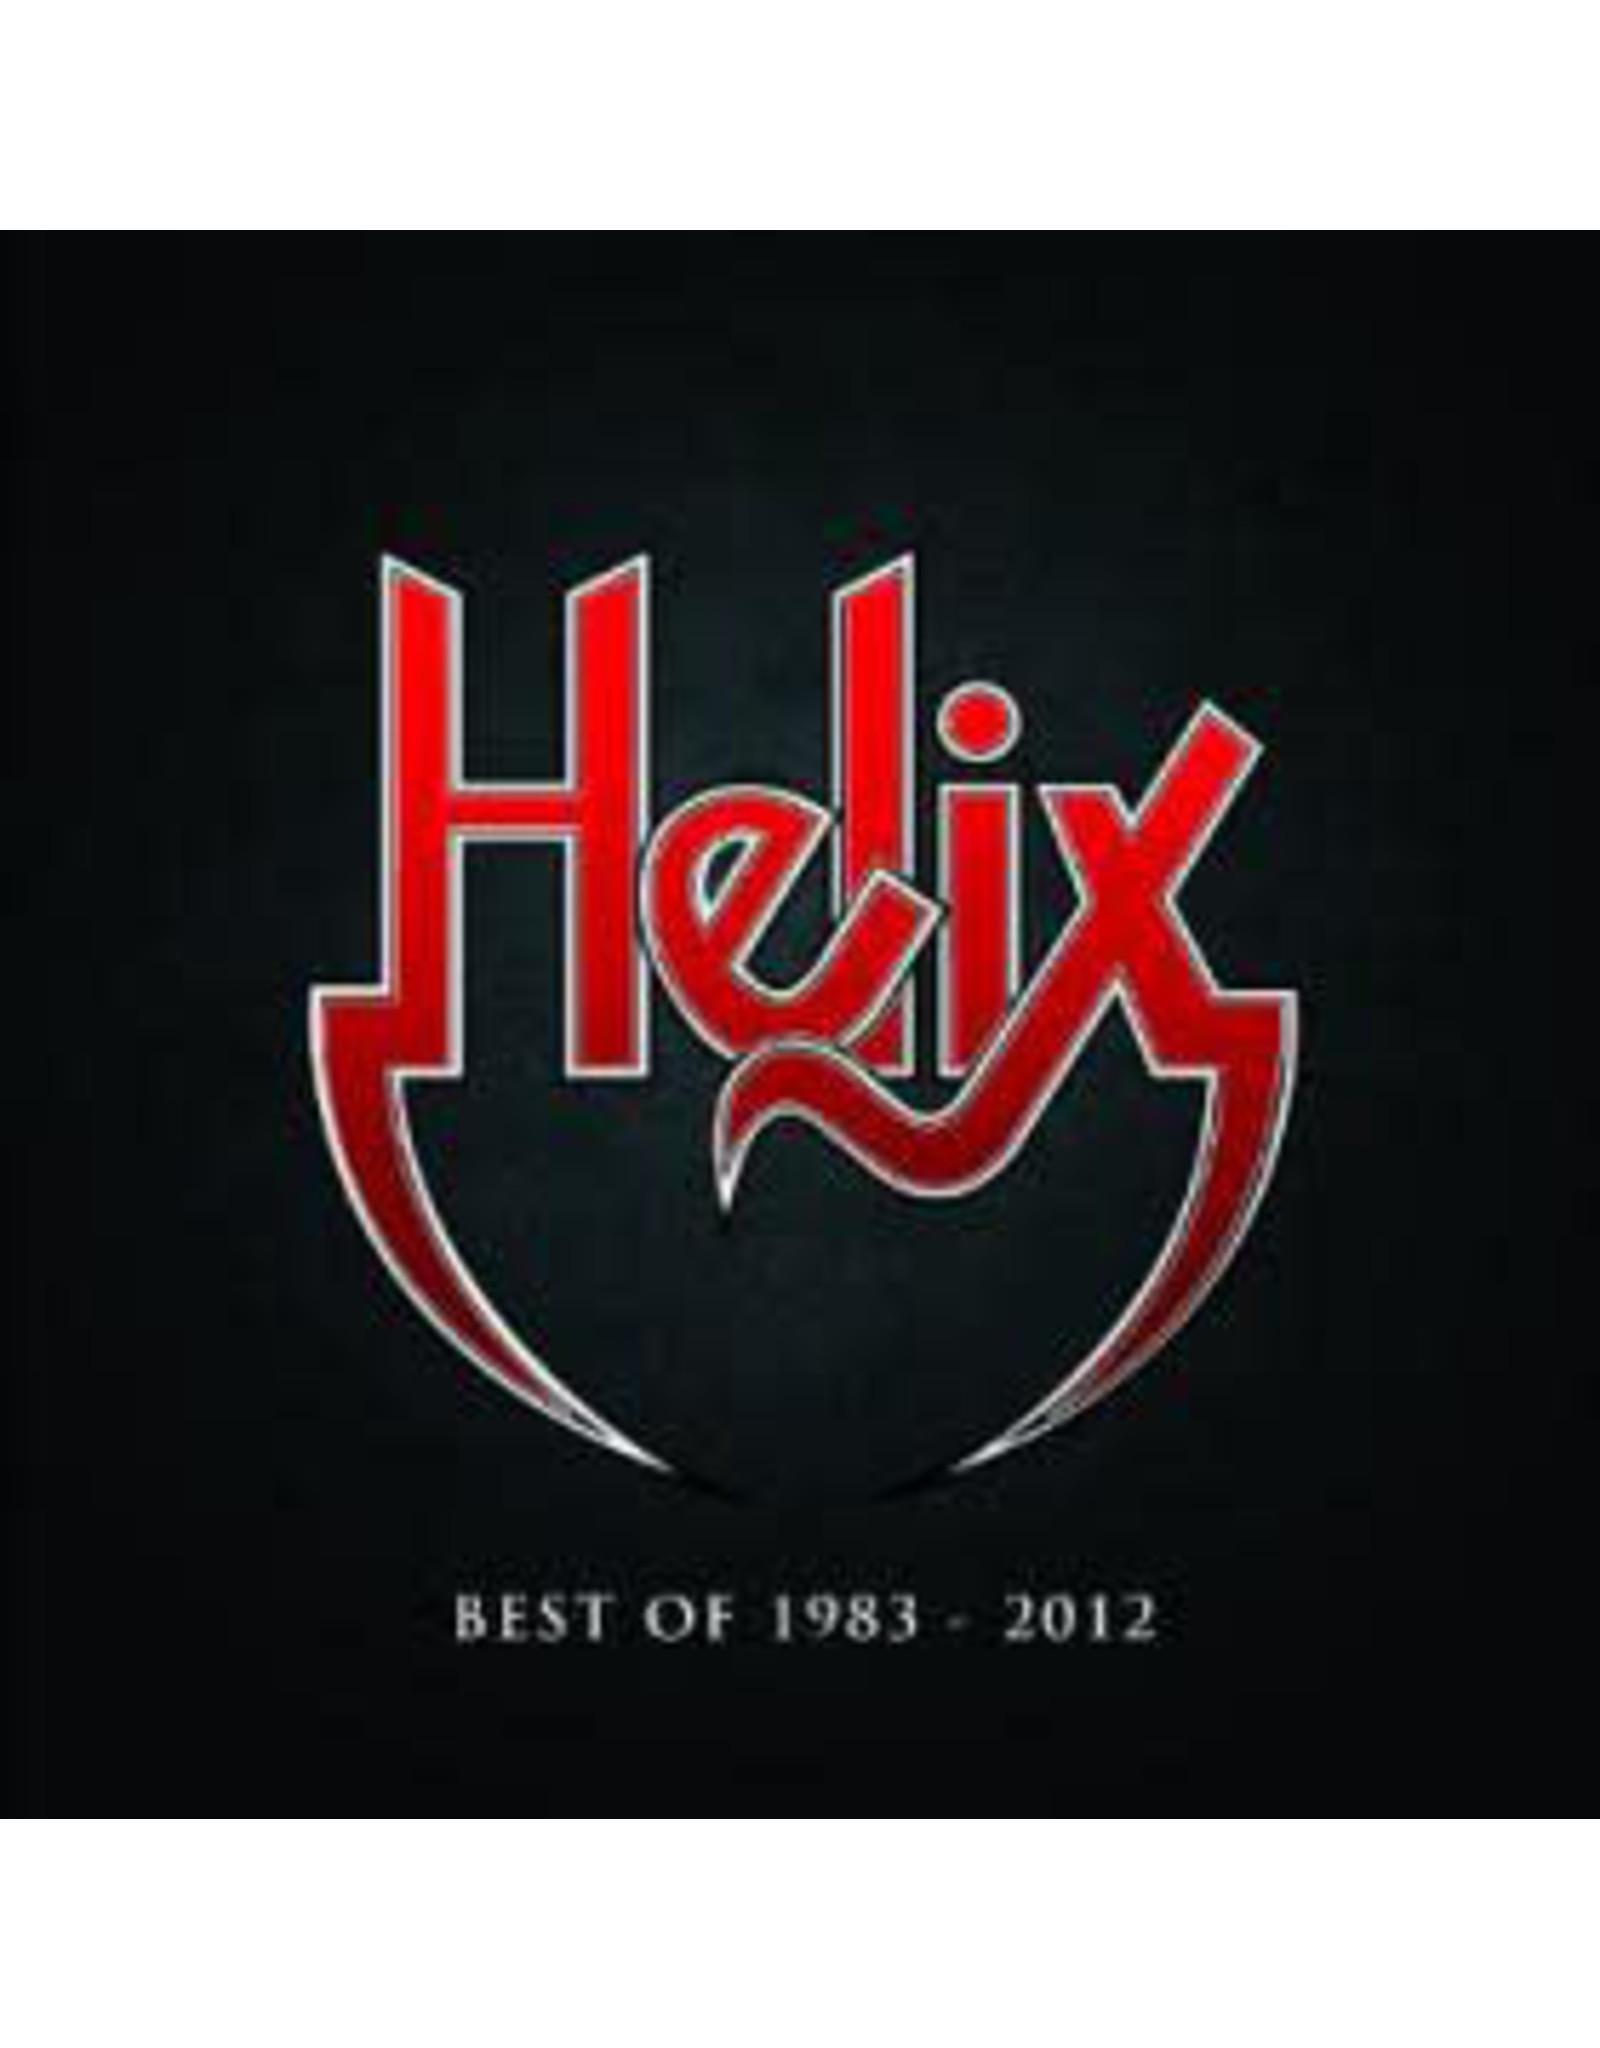 Helix - Best of 1983-2012 CD